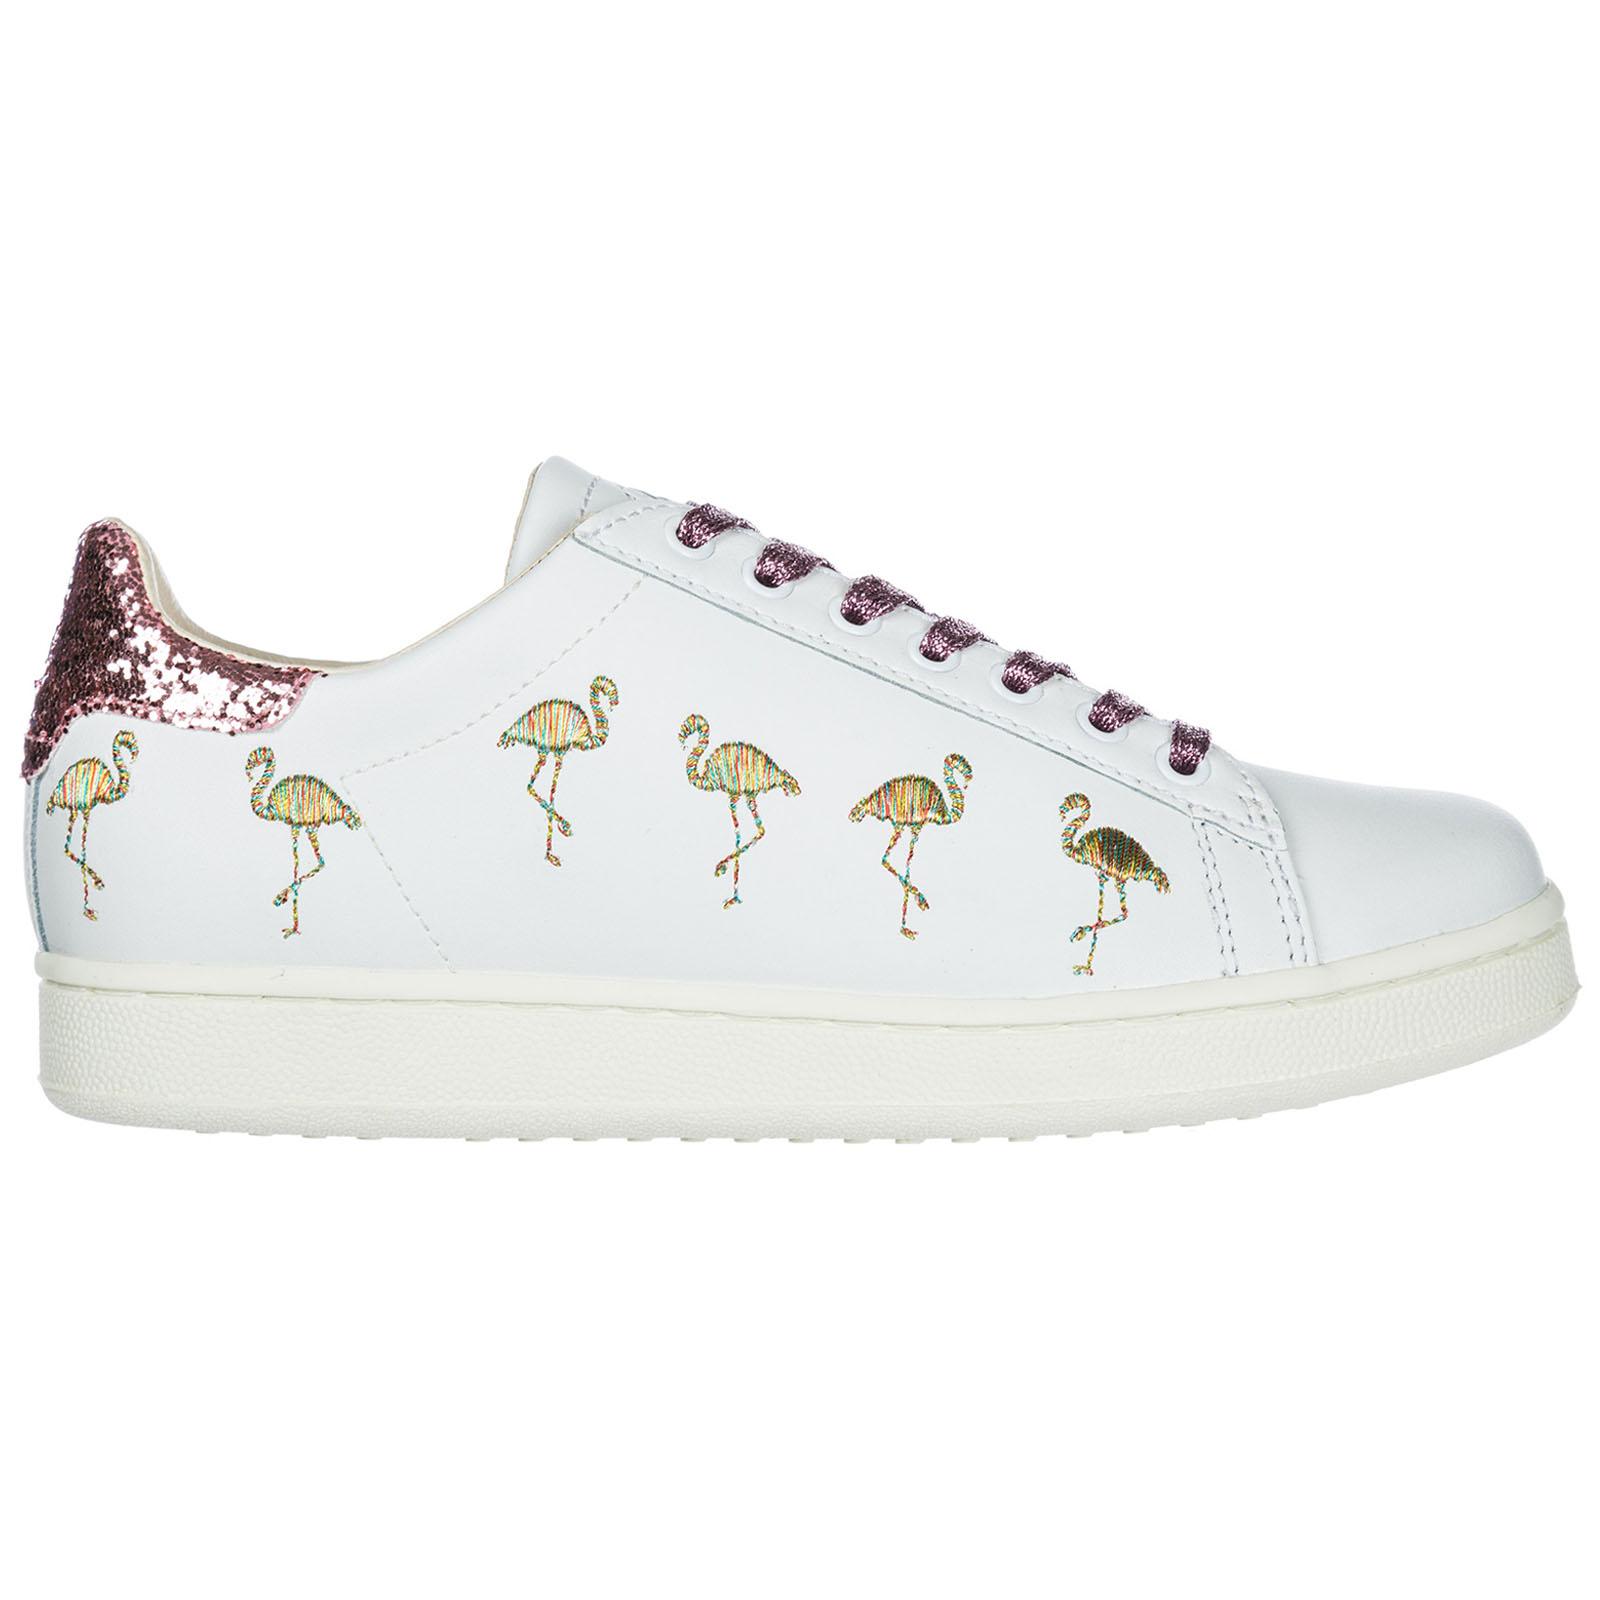 Scarpe sneakers donna in pelle flamingo